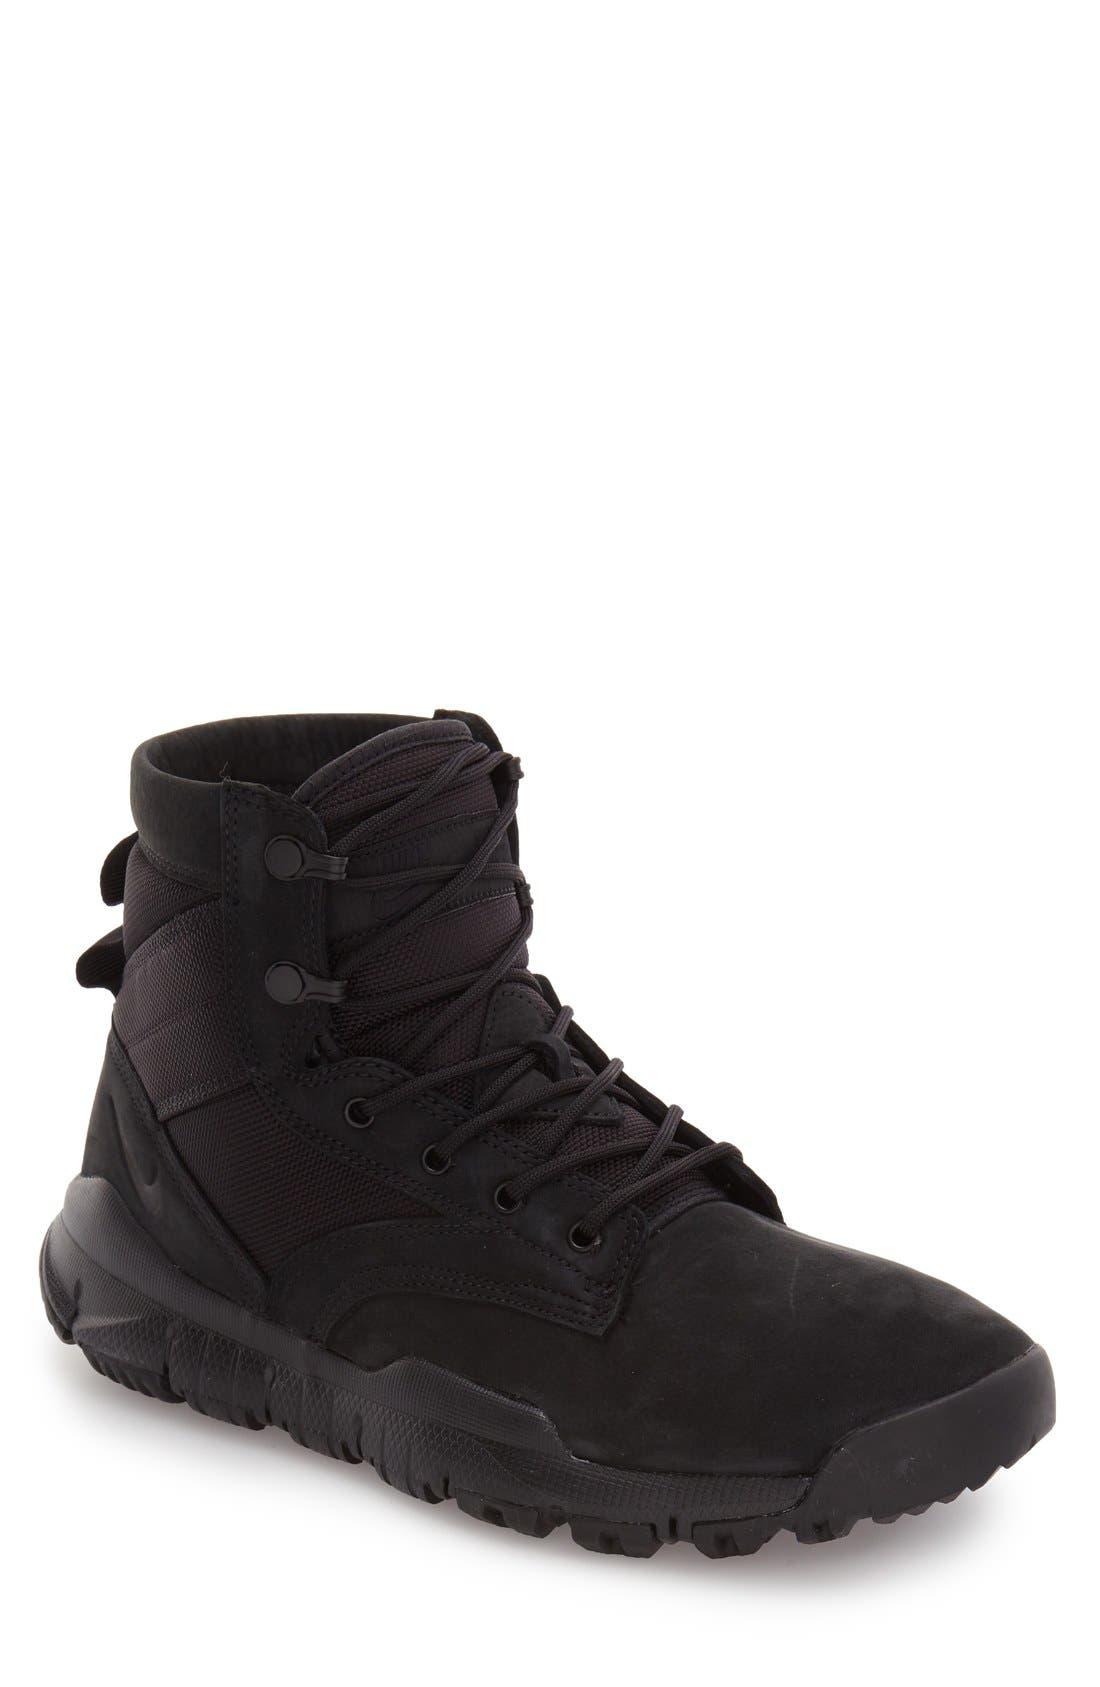 'SFB' Plain Toe Boot,                             Main thumbnail 1, color,                             001